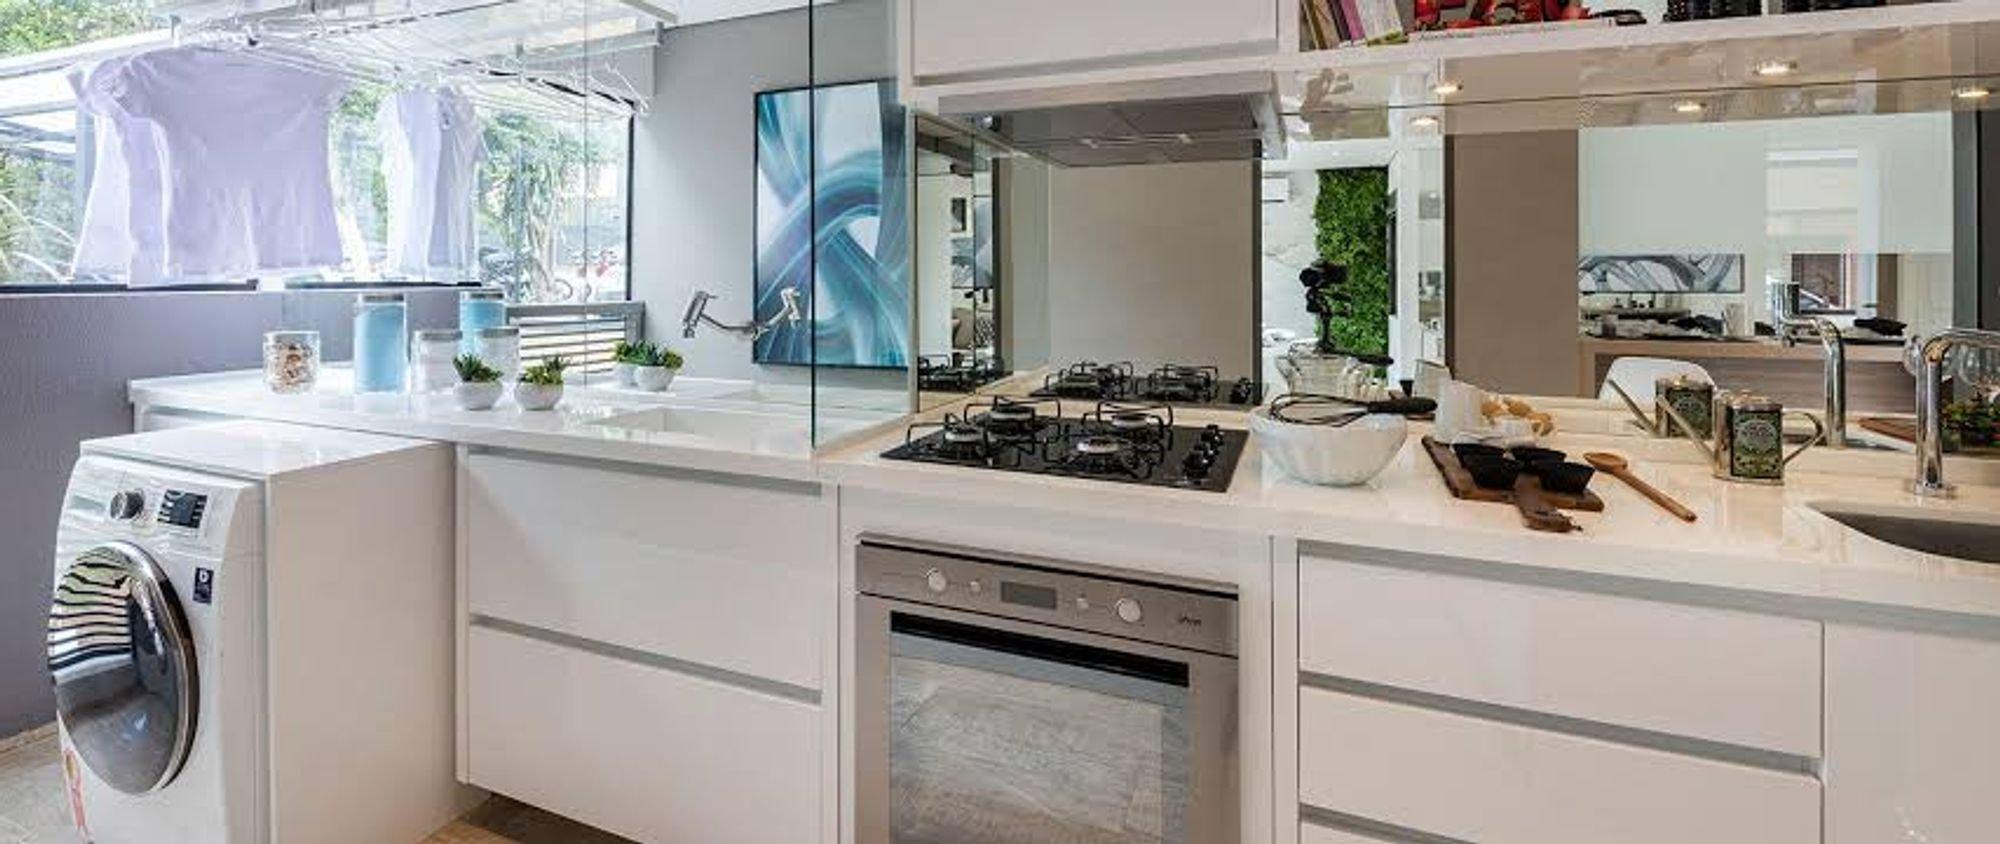 Foto de Cozinha com vaso de planta, vaso, forno, pia